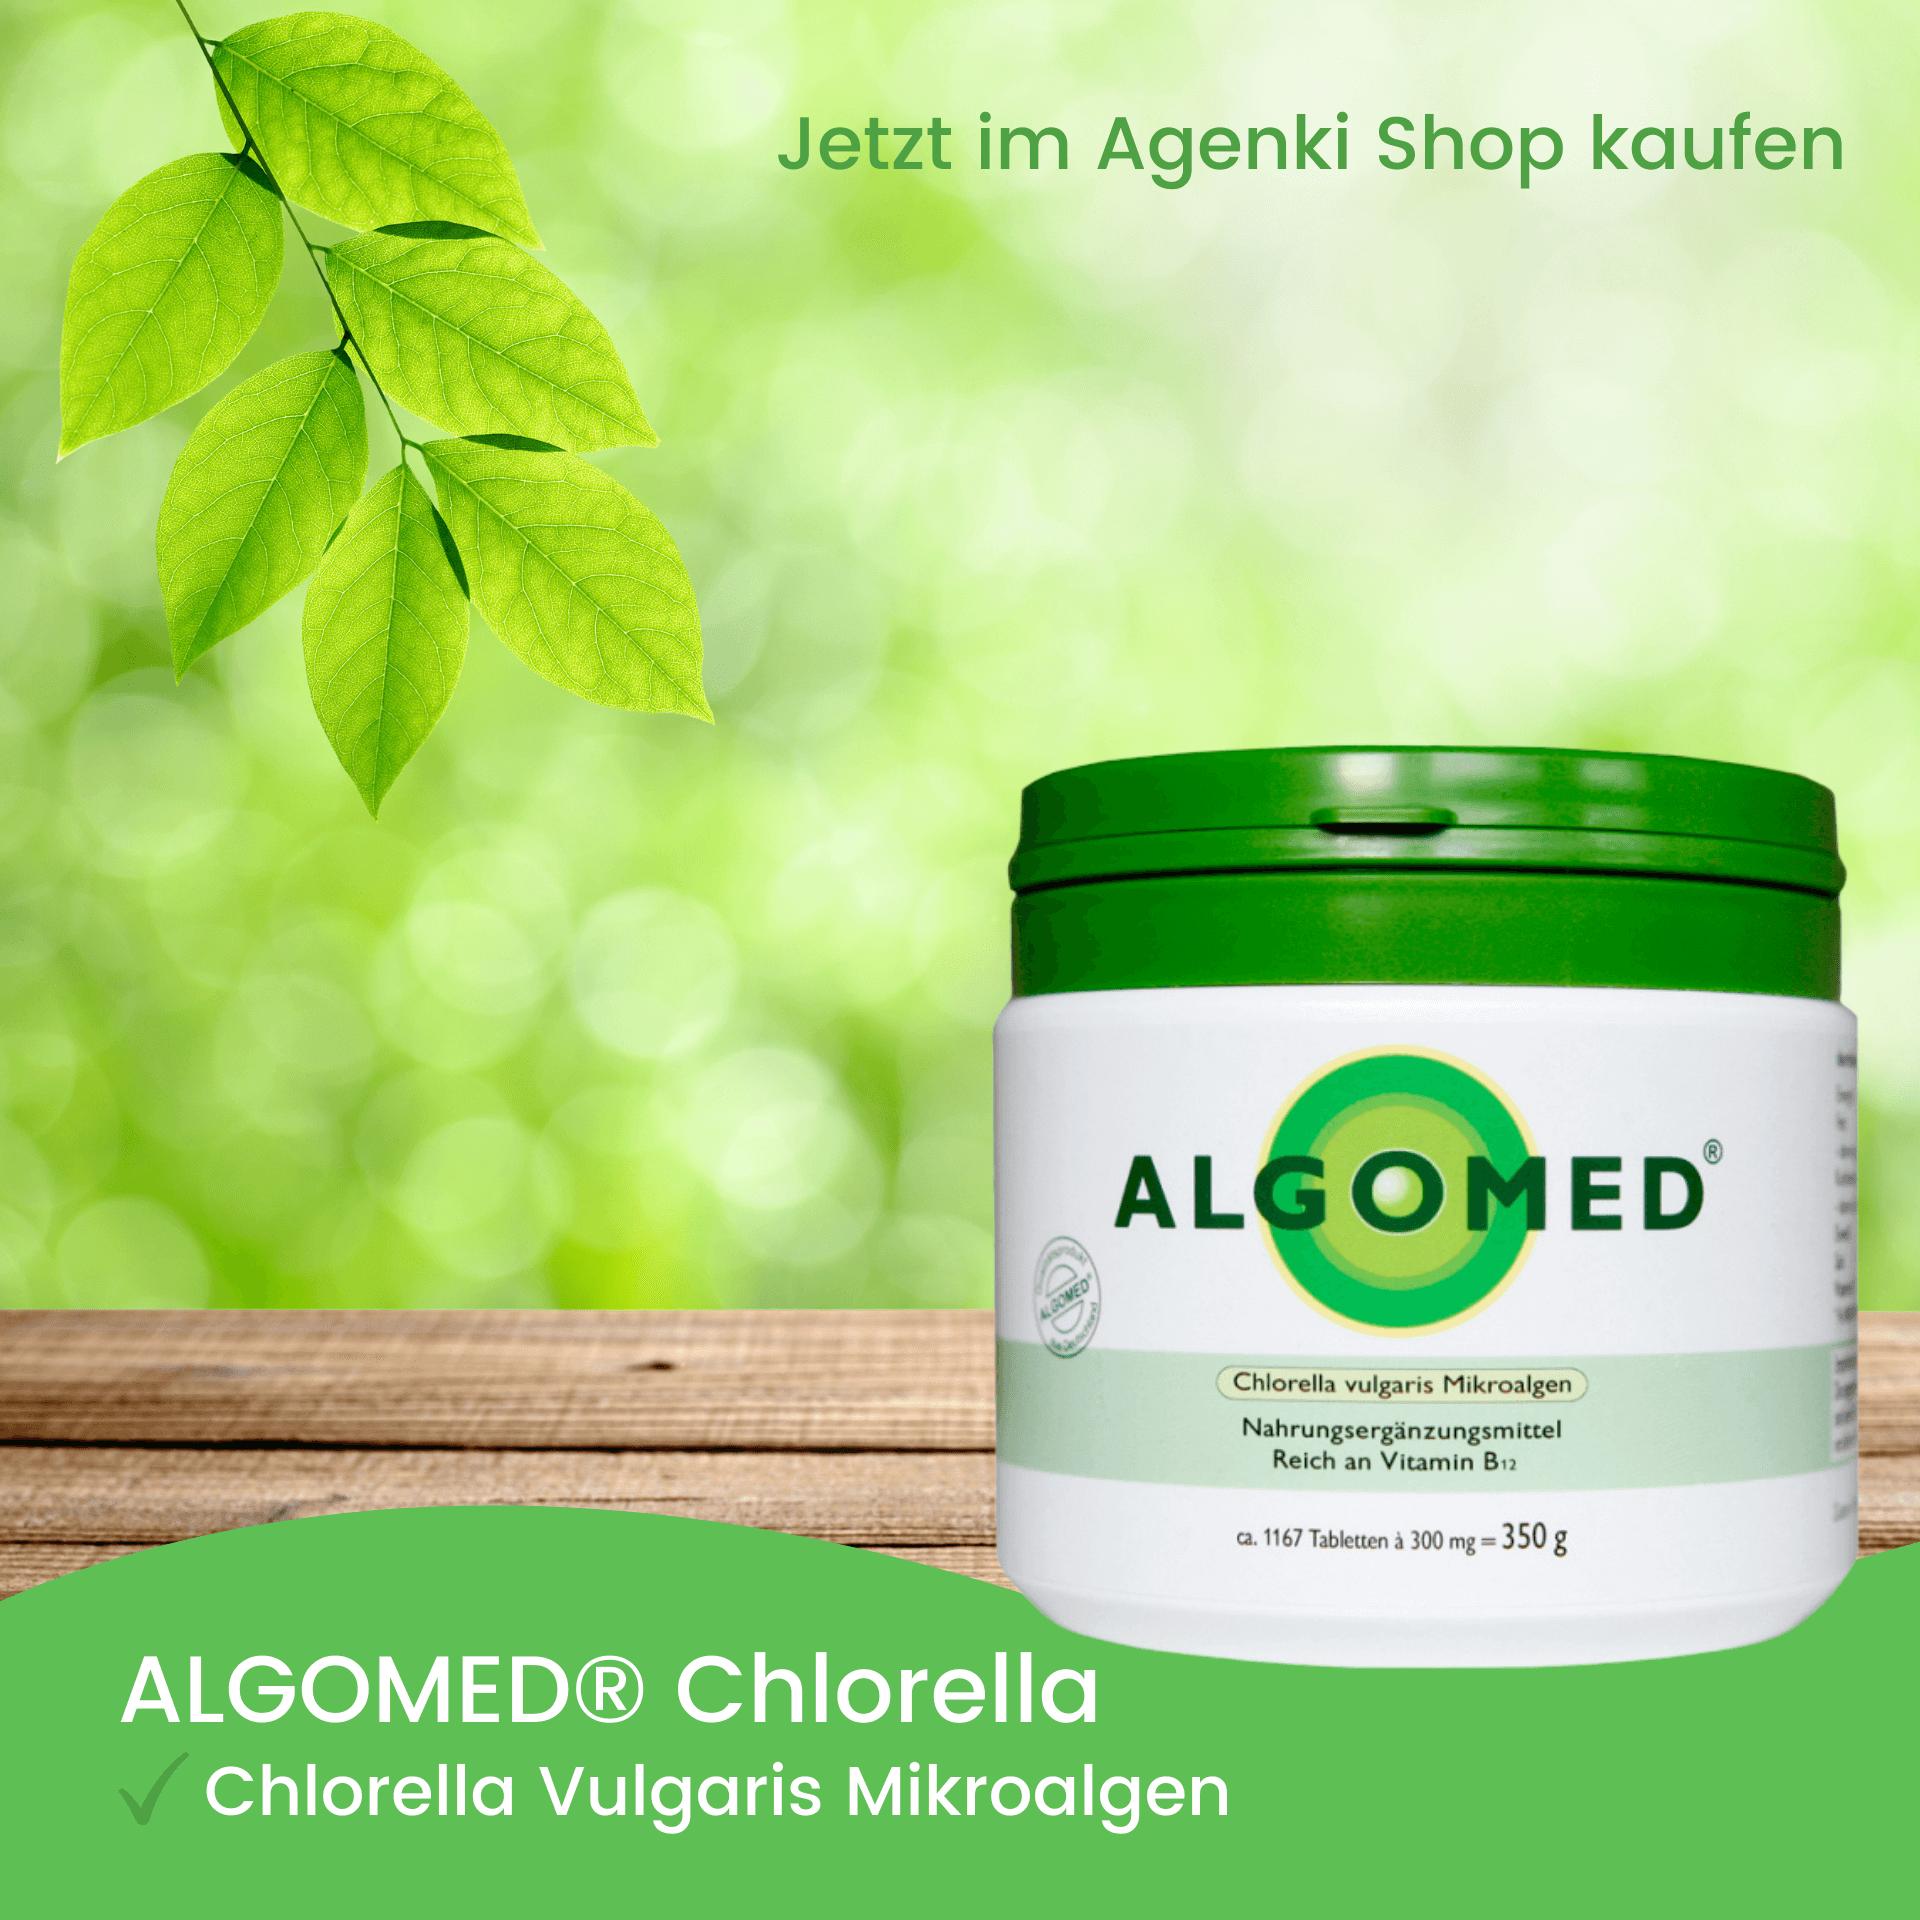 Chlorella Vulgaris Mikroalgen - Algomed Chlorella - Agenki